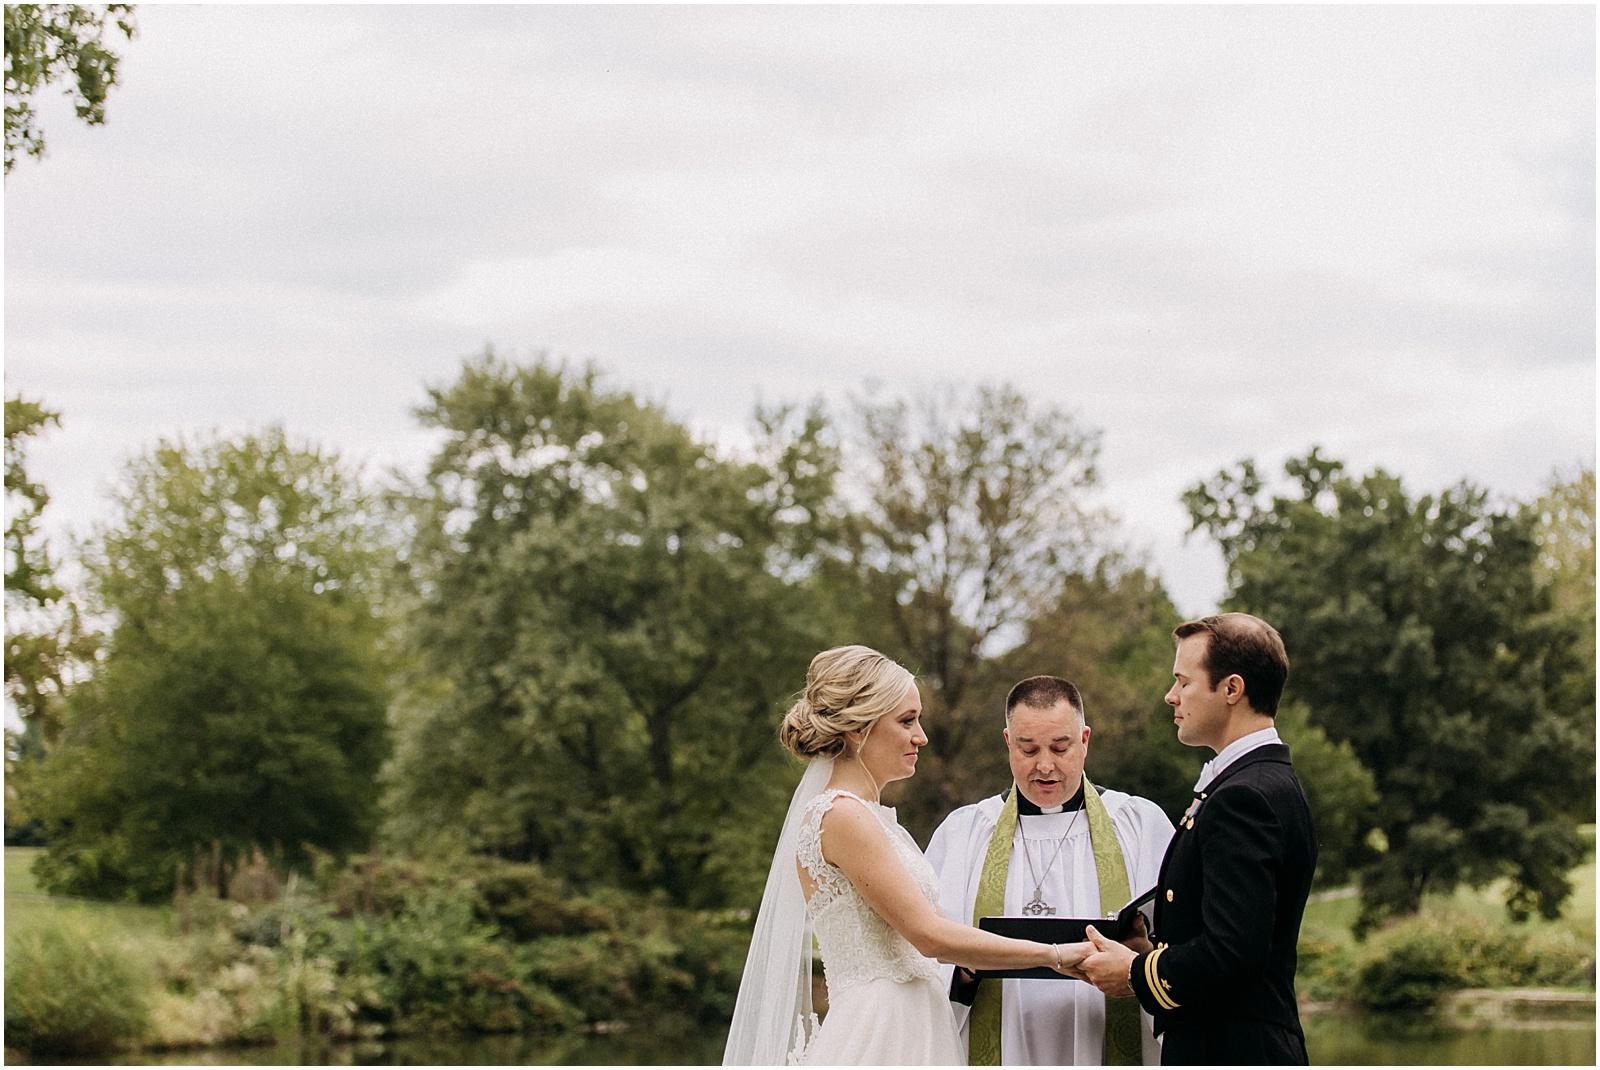 glen_echo_st_louis_mo_wedding_0110.jpg